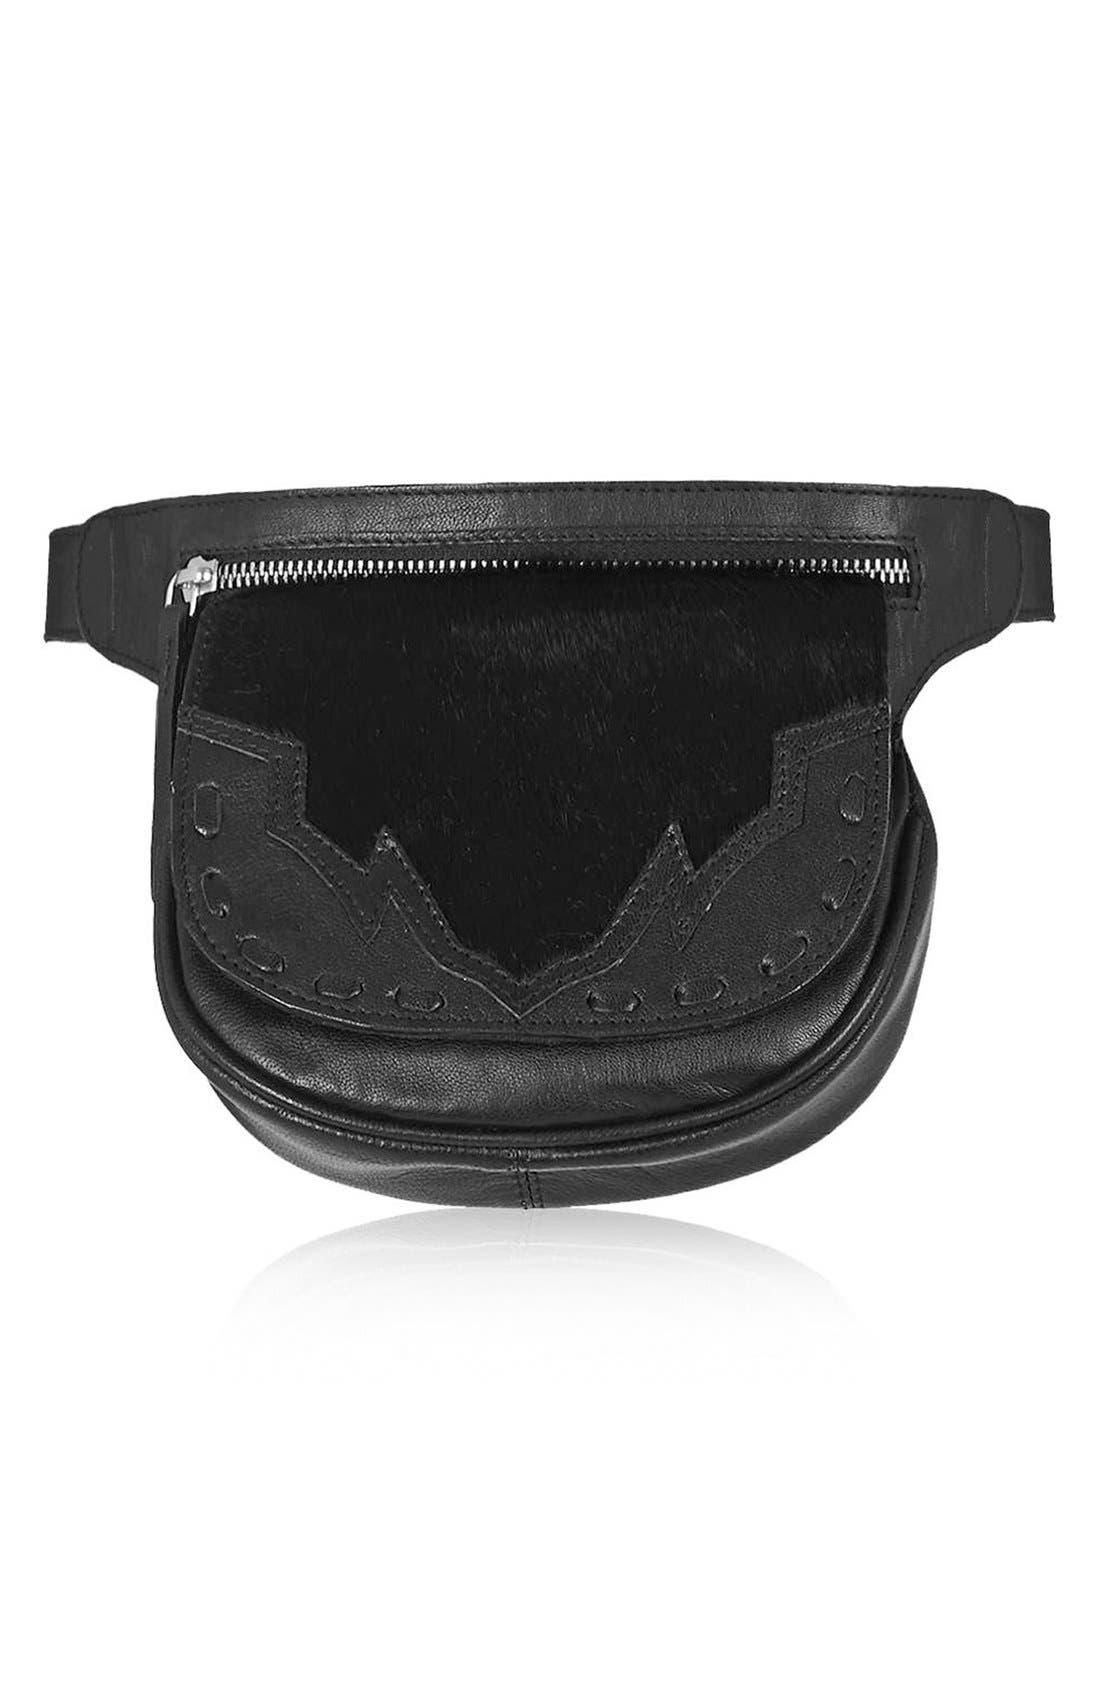 Main Image - Topshop Western Leather & Calf Hair Belt Bag